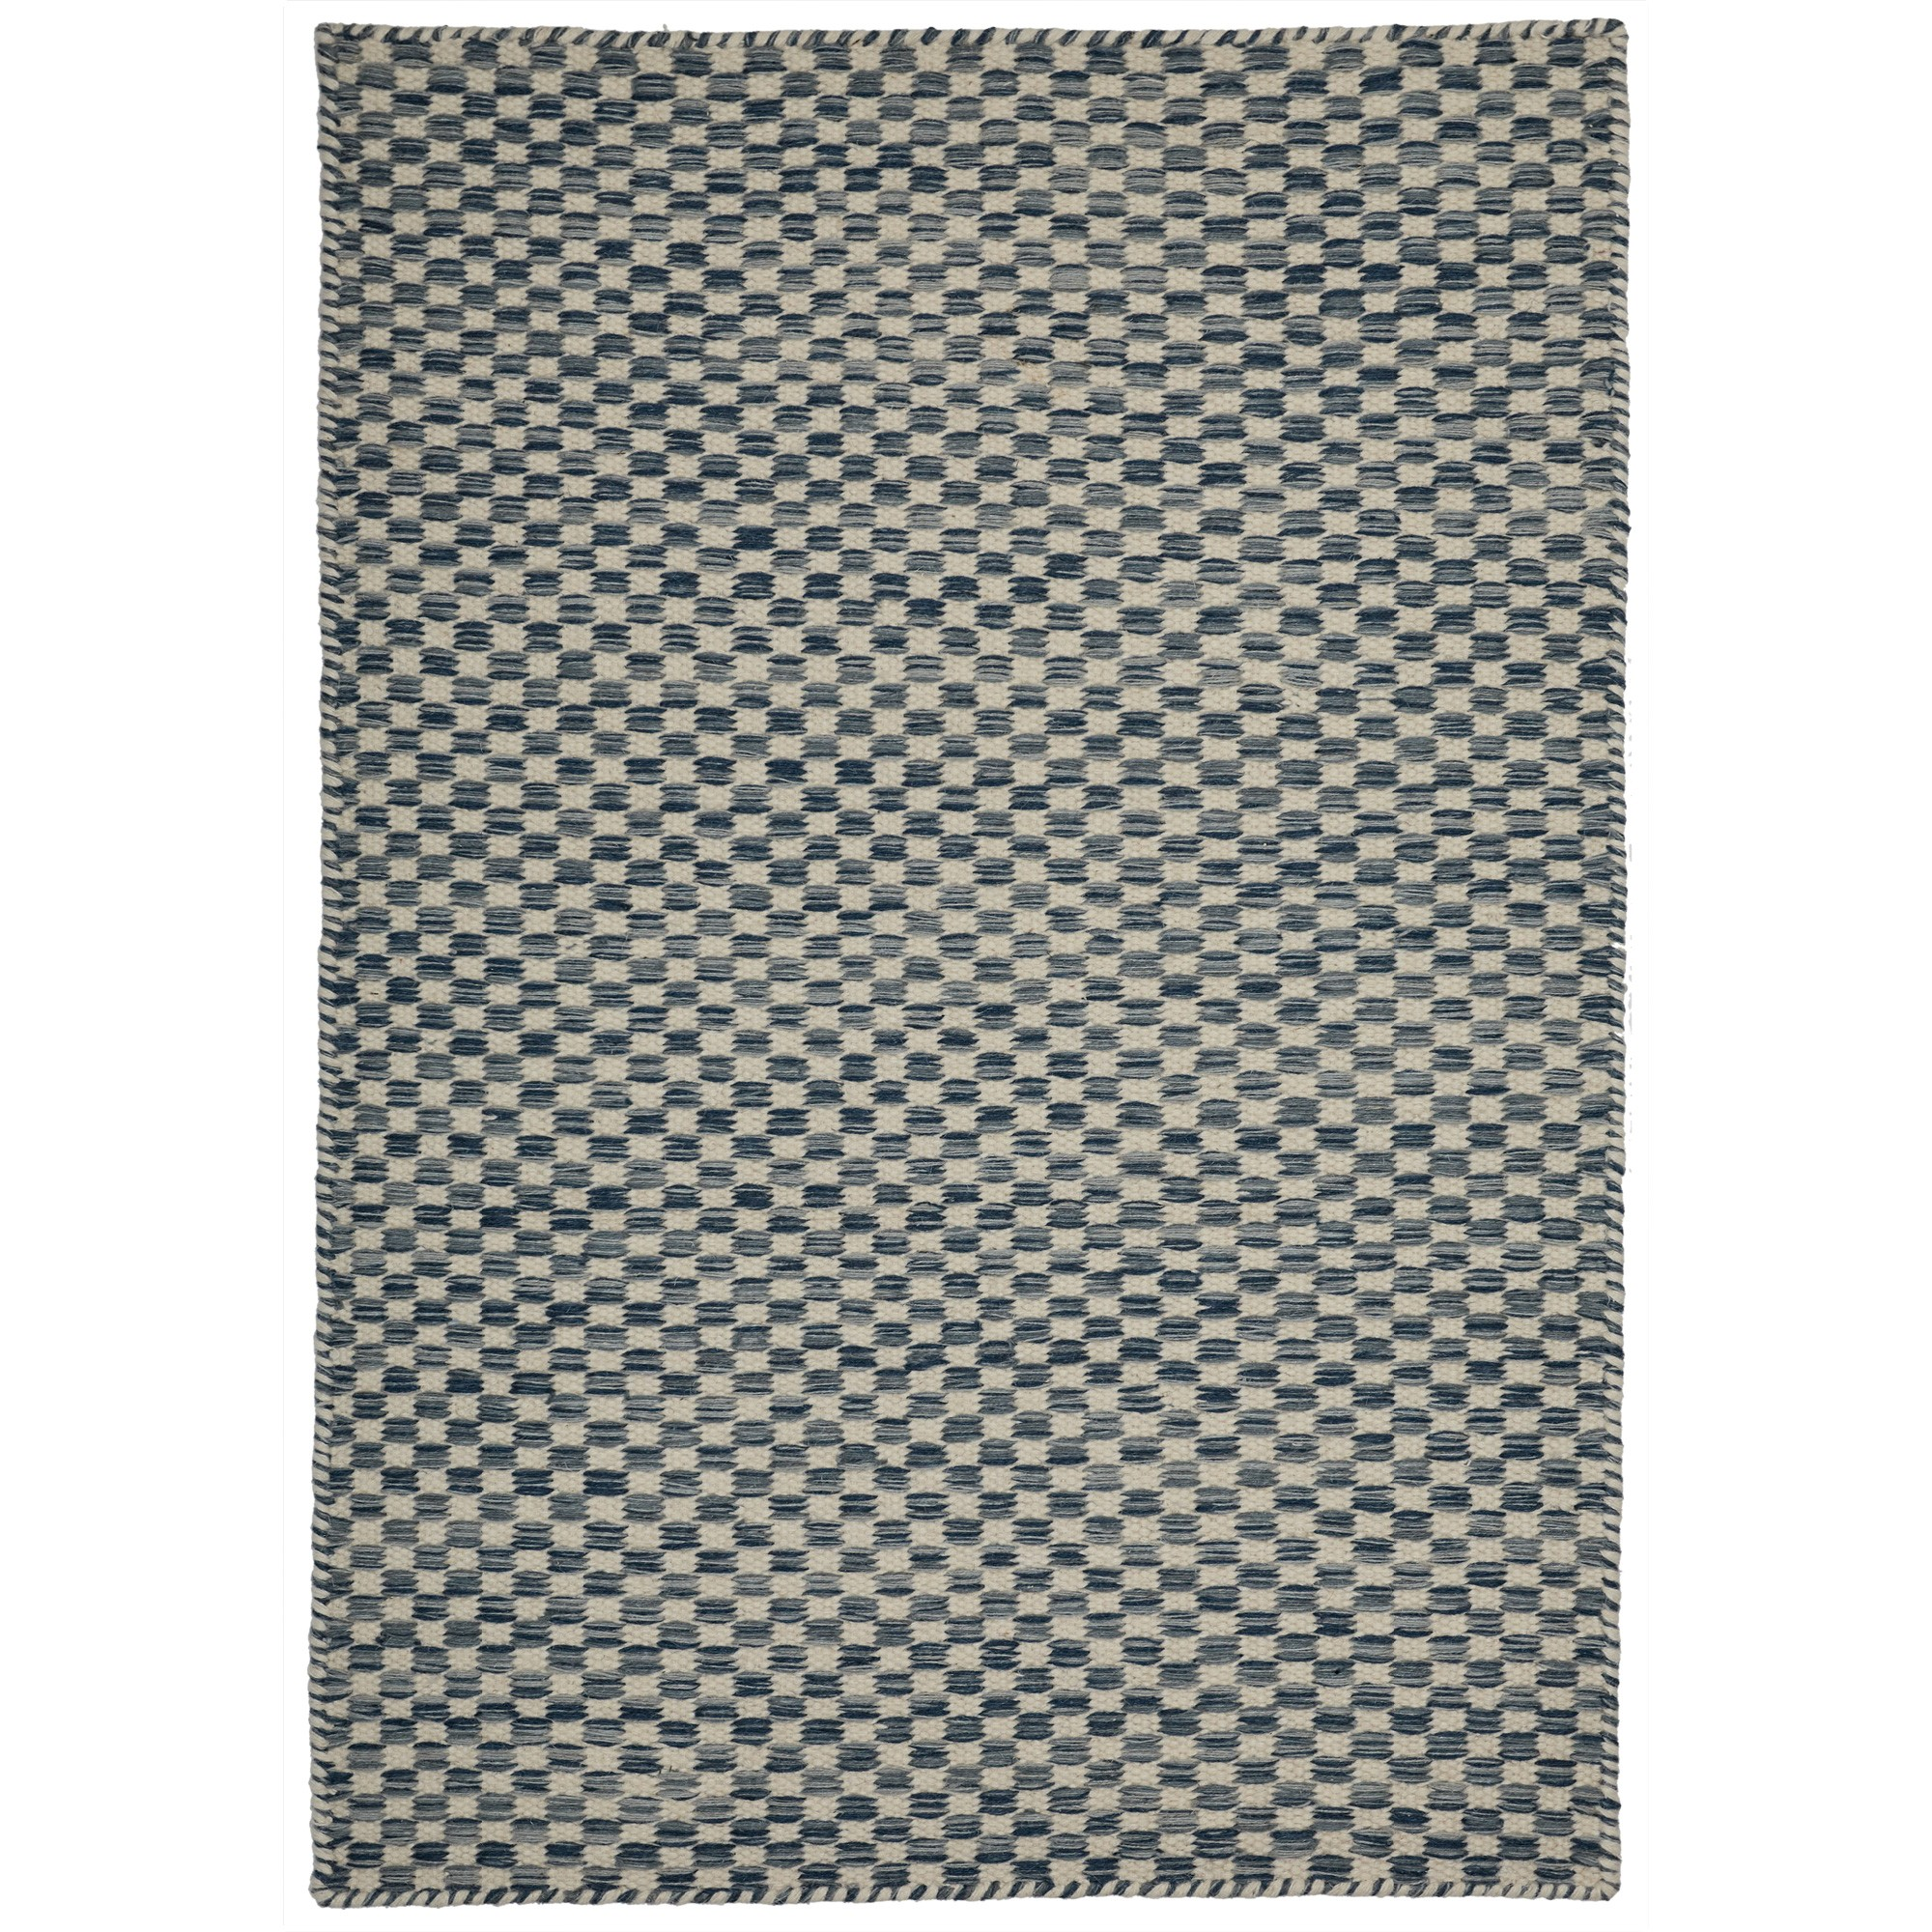 Madrid Handcrafted Modern Wool Rug, 330x240cm, Blue / Ivory